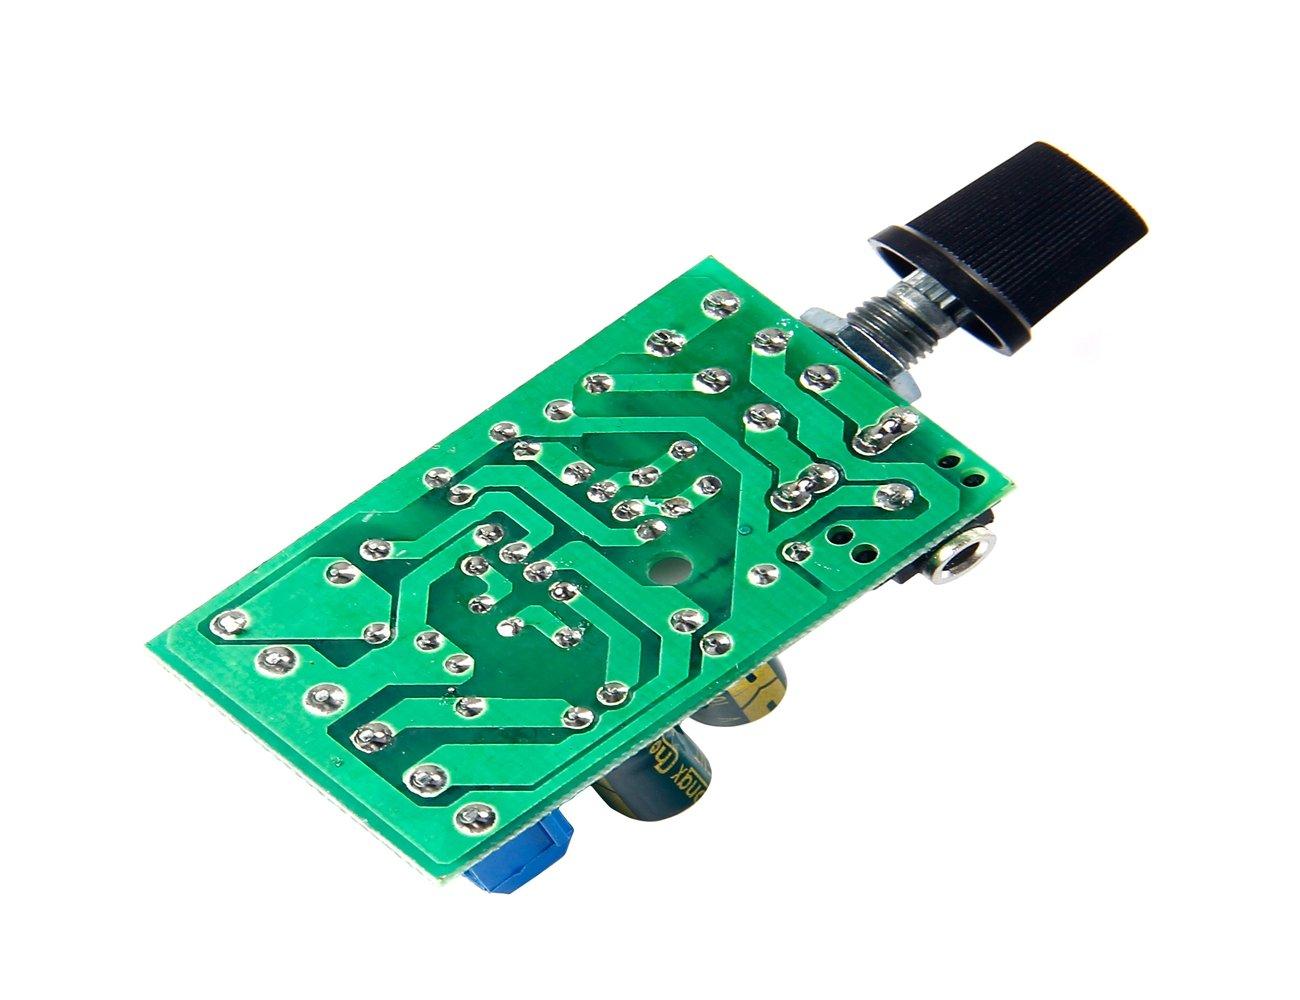 winwill DC1.8/ /12/V tda2822/m amplificador 2.0/canales est/éreo AUX Audio Amp Junta M/ódulo